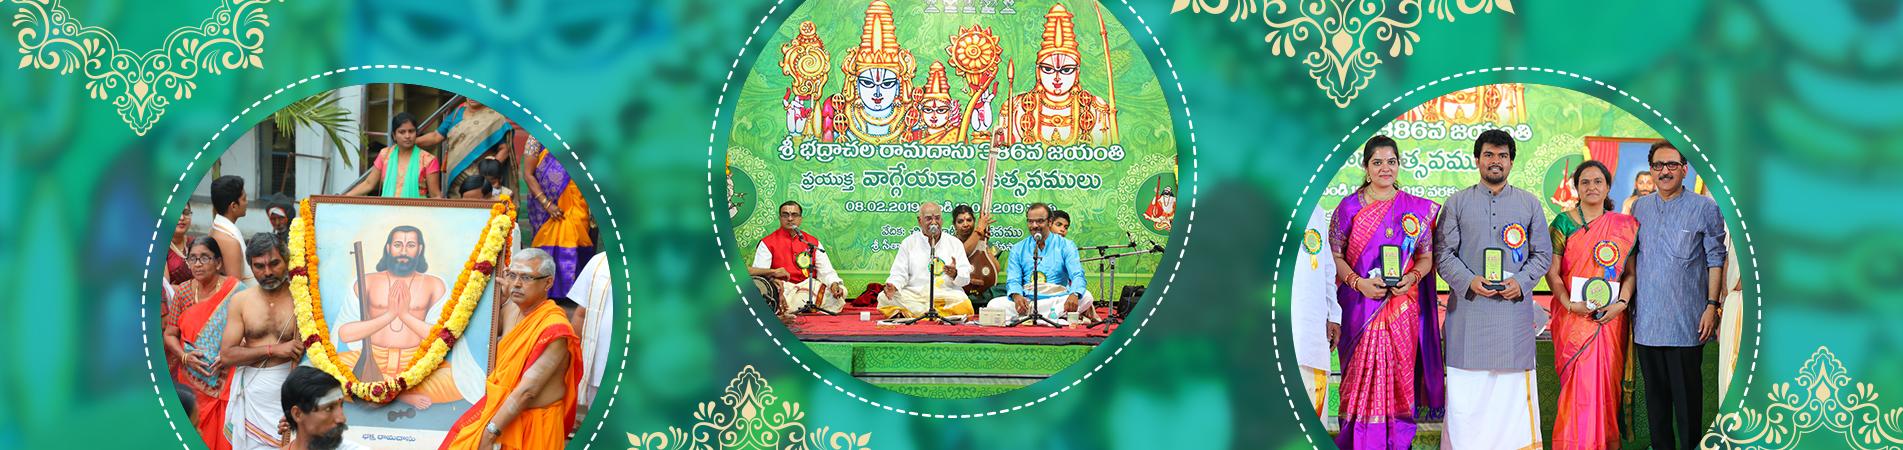 Bhadrachalam-banner386-uthsavam